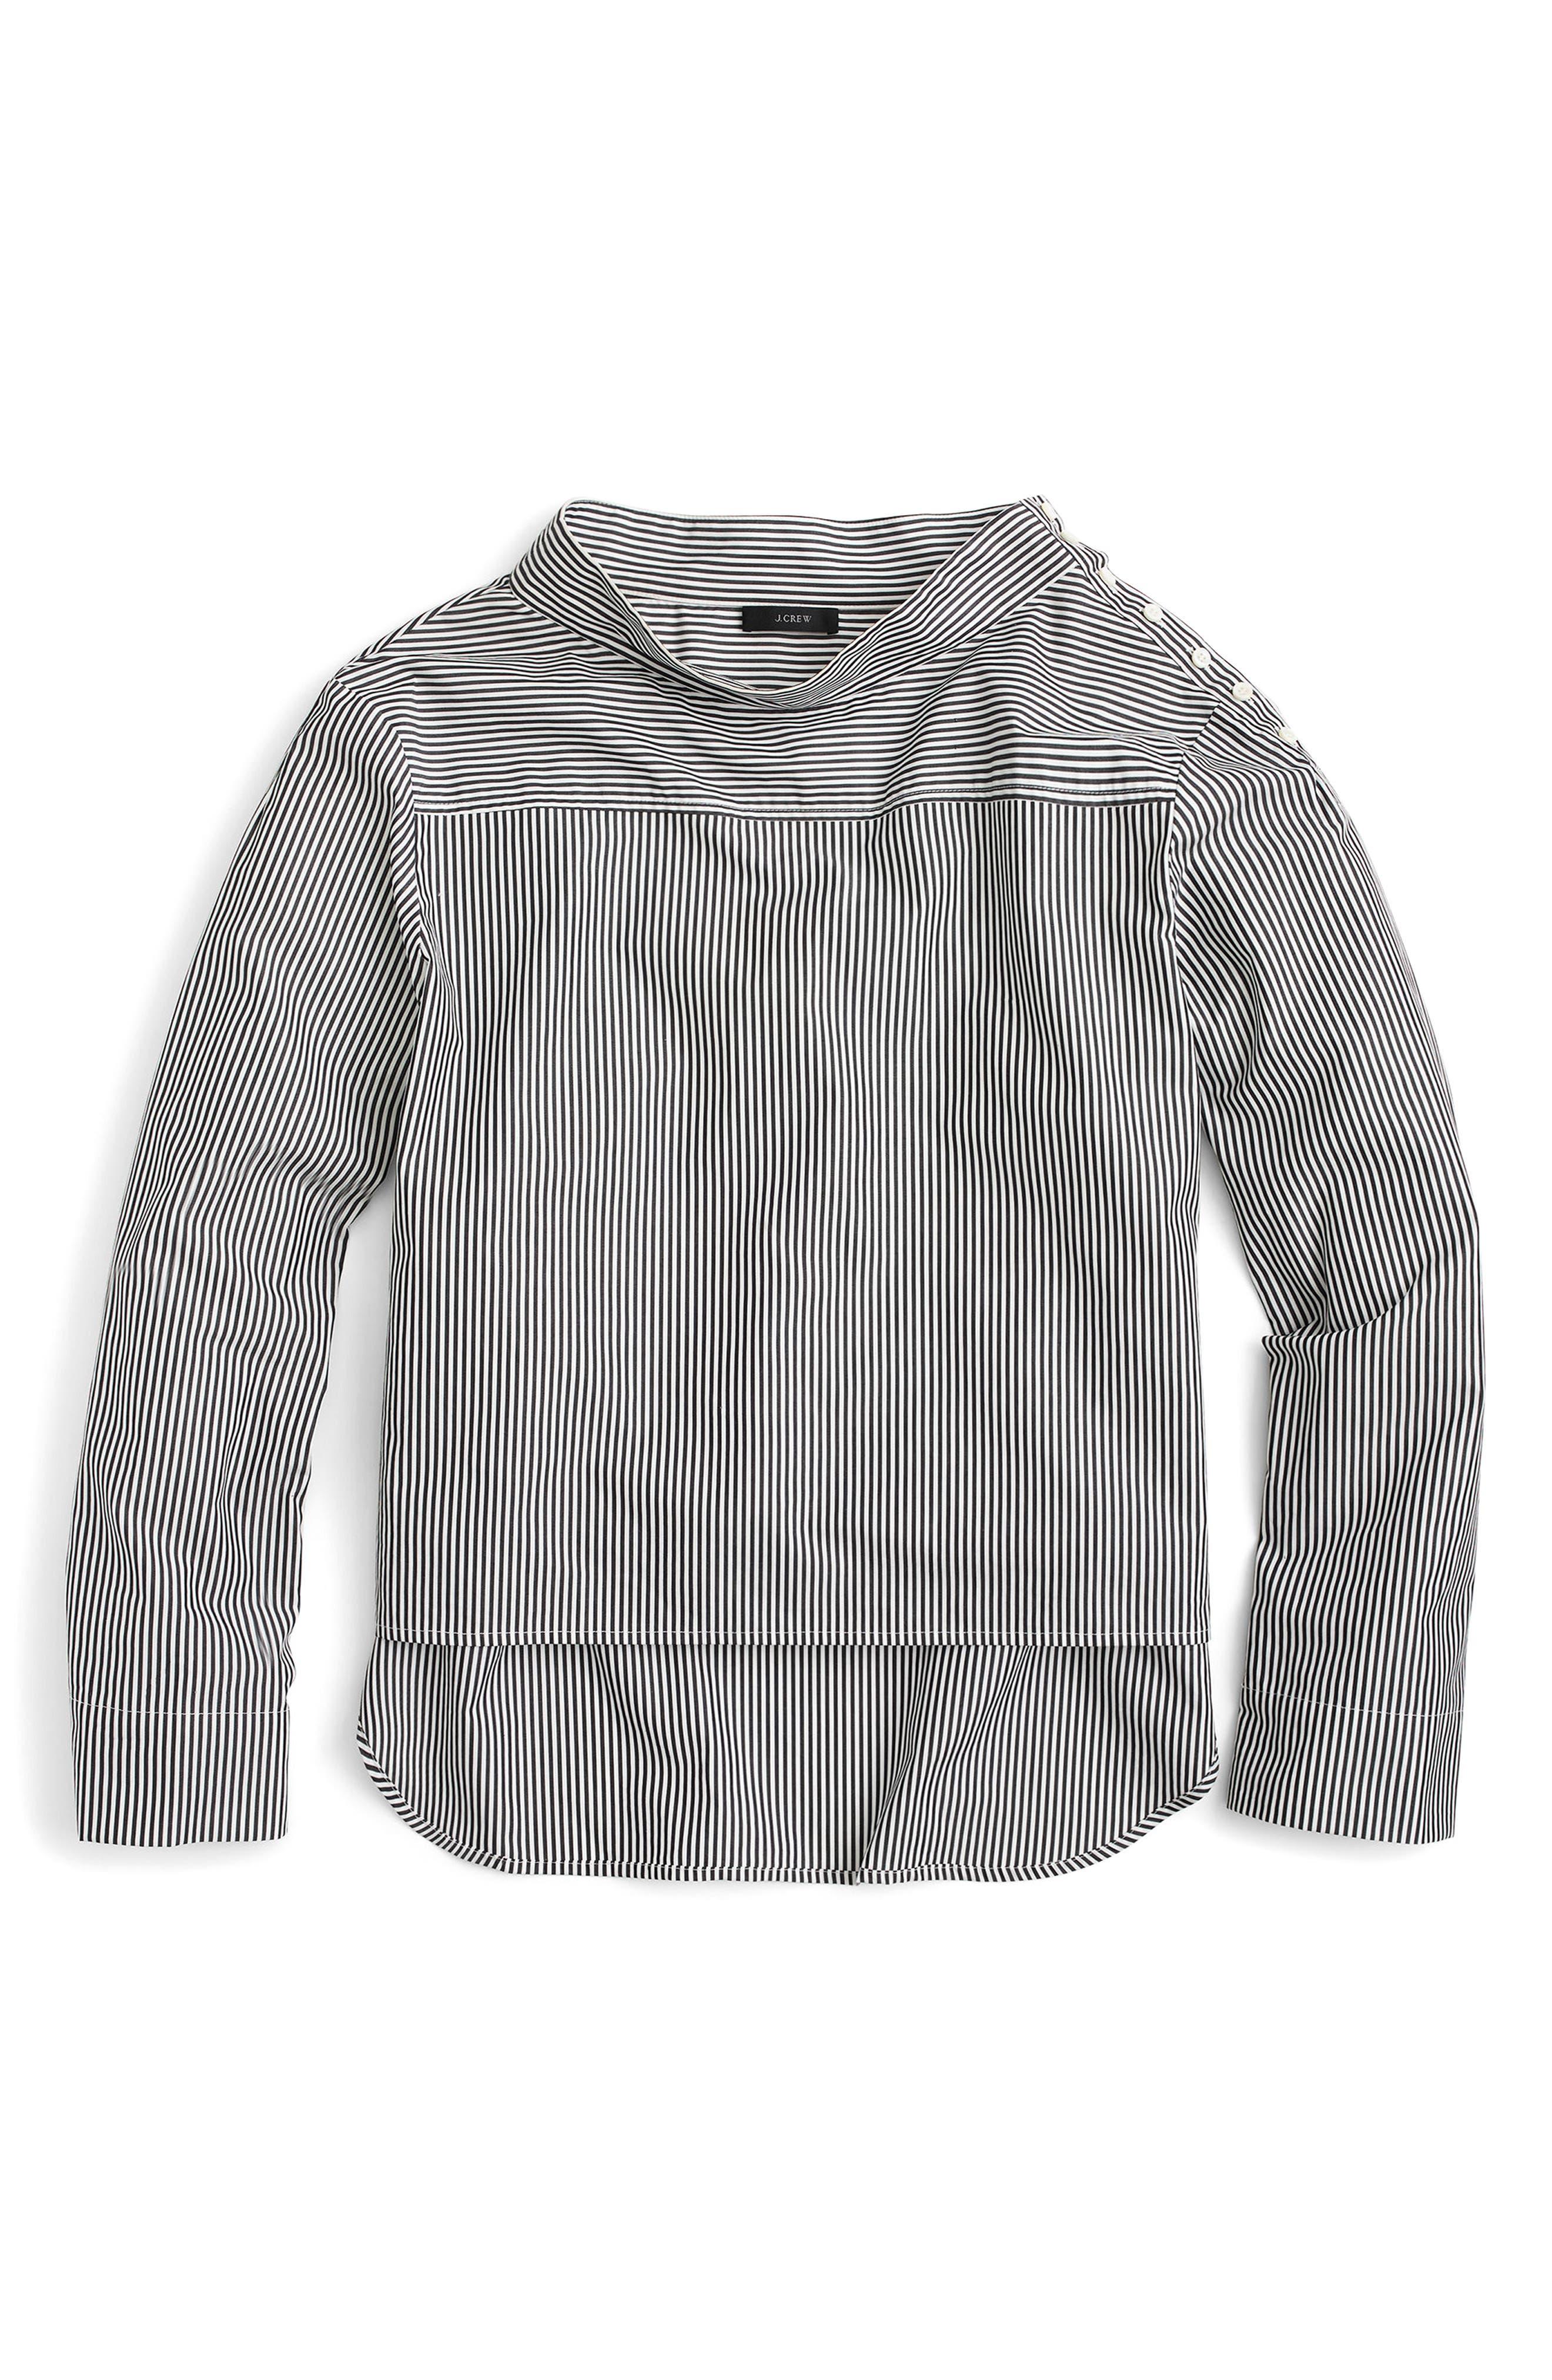 Alternate Image 1 Selected - J.Crew Funnel Neck Stripe Shirt (Regular & Petite)